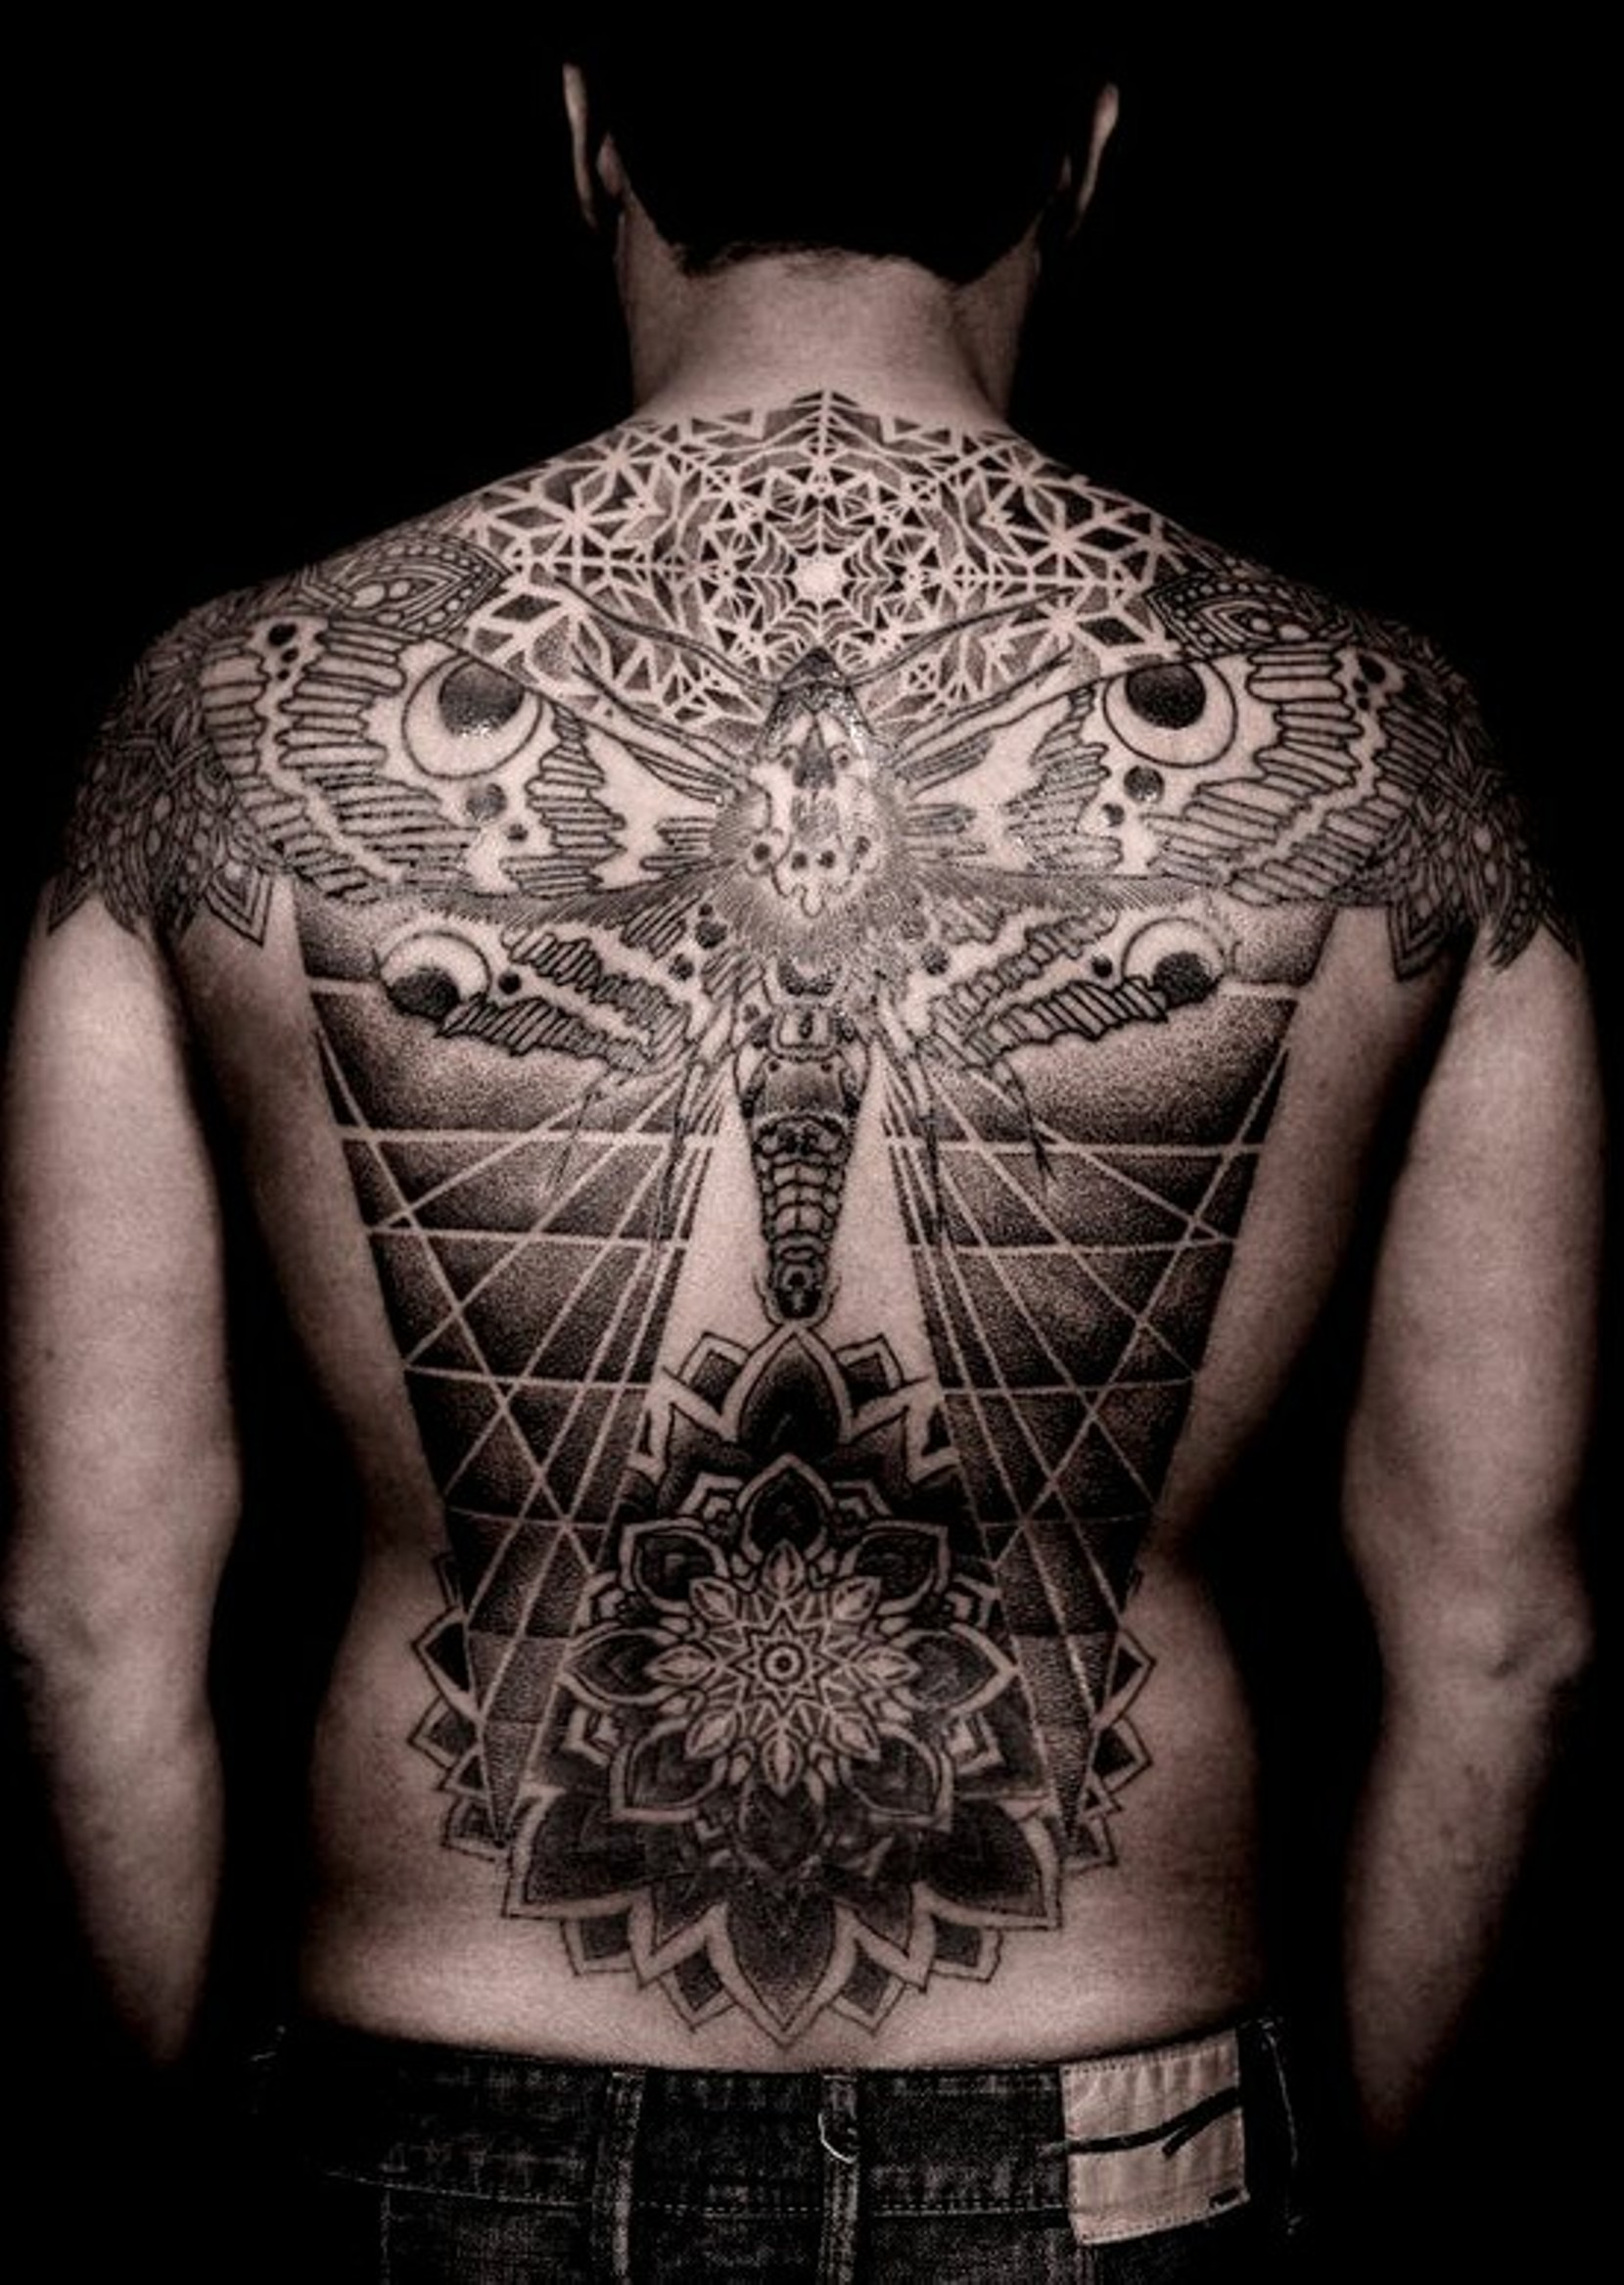 6da0d3b6da3b9 Done @ Saved Tattoos – NY – Artist: Thomas Hooper.. Mix of scared geometry  / mandalas and the moth.